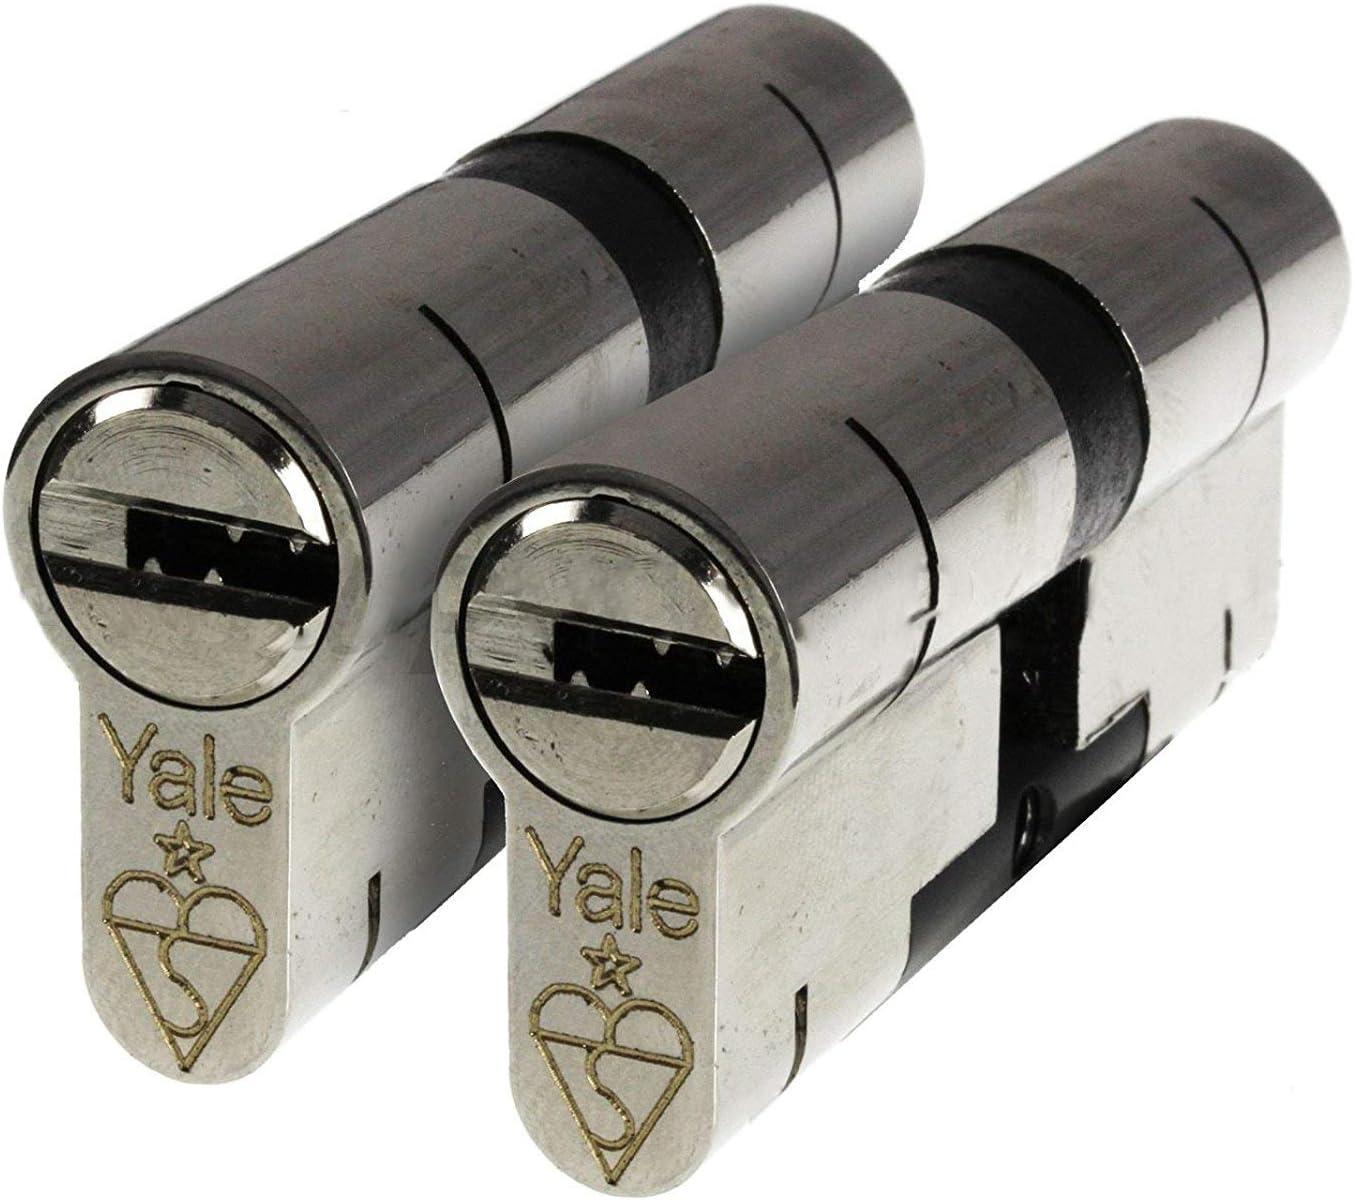 70mm Nickel YALE Platinum 3 Star Euro Cylinder Anti Snap Bump High Security uPVC Door Barrel TS2007:2013 Lock 35//35